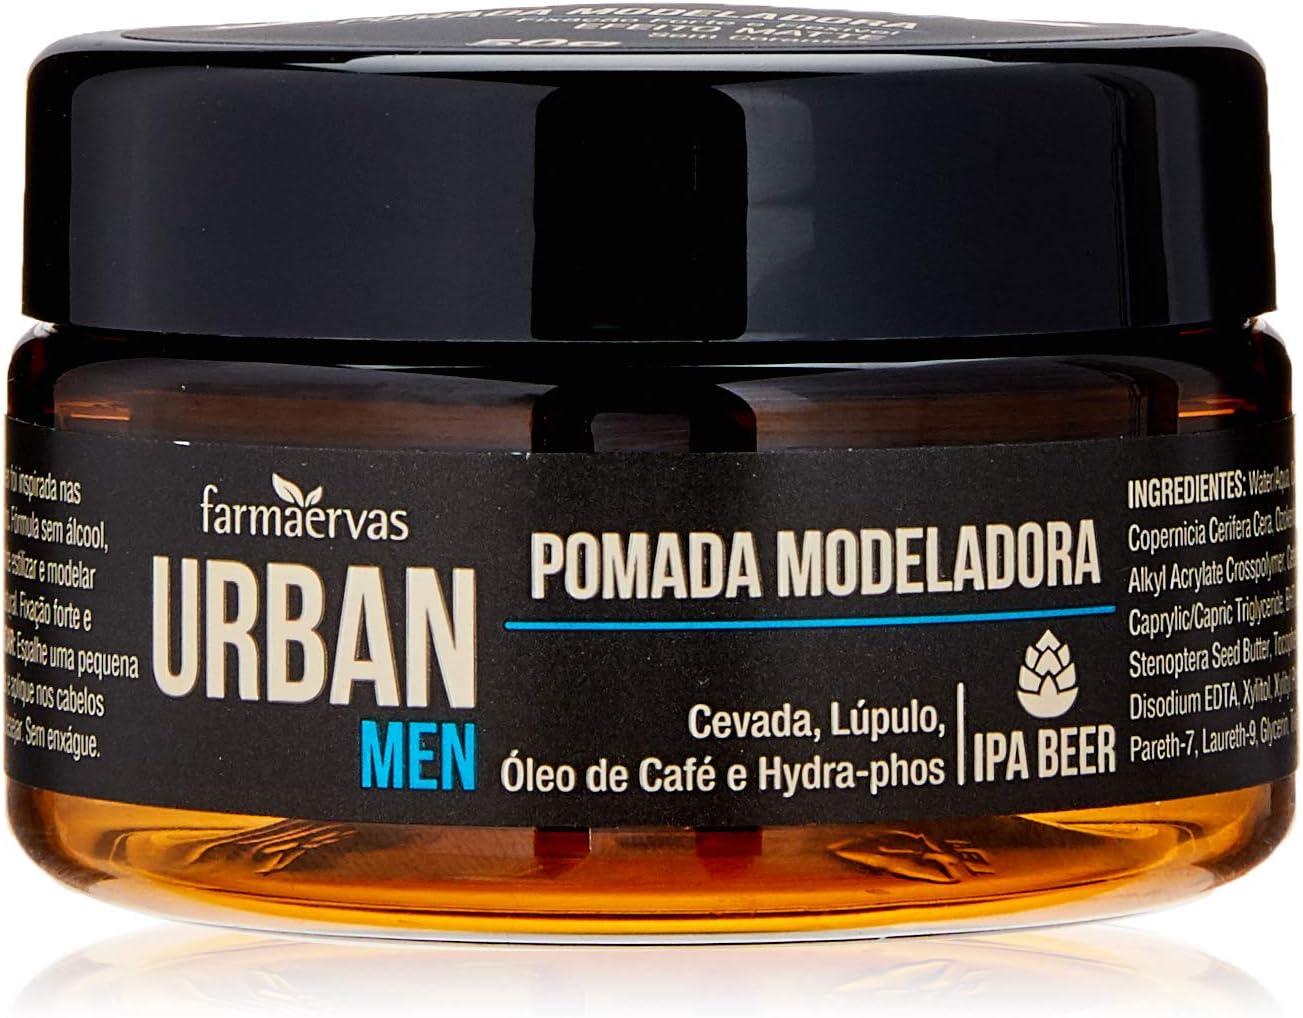 Pomada Modeladora Urban Men IPA, Urban, Branca Transparente, 50G por Urban